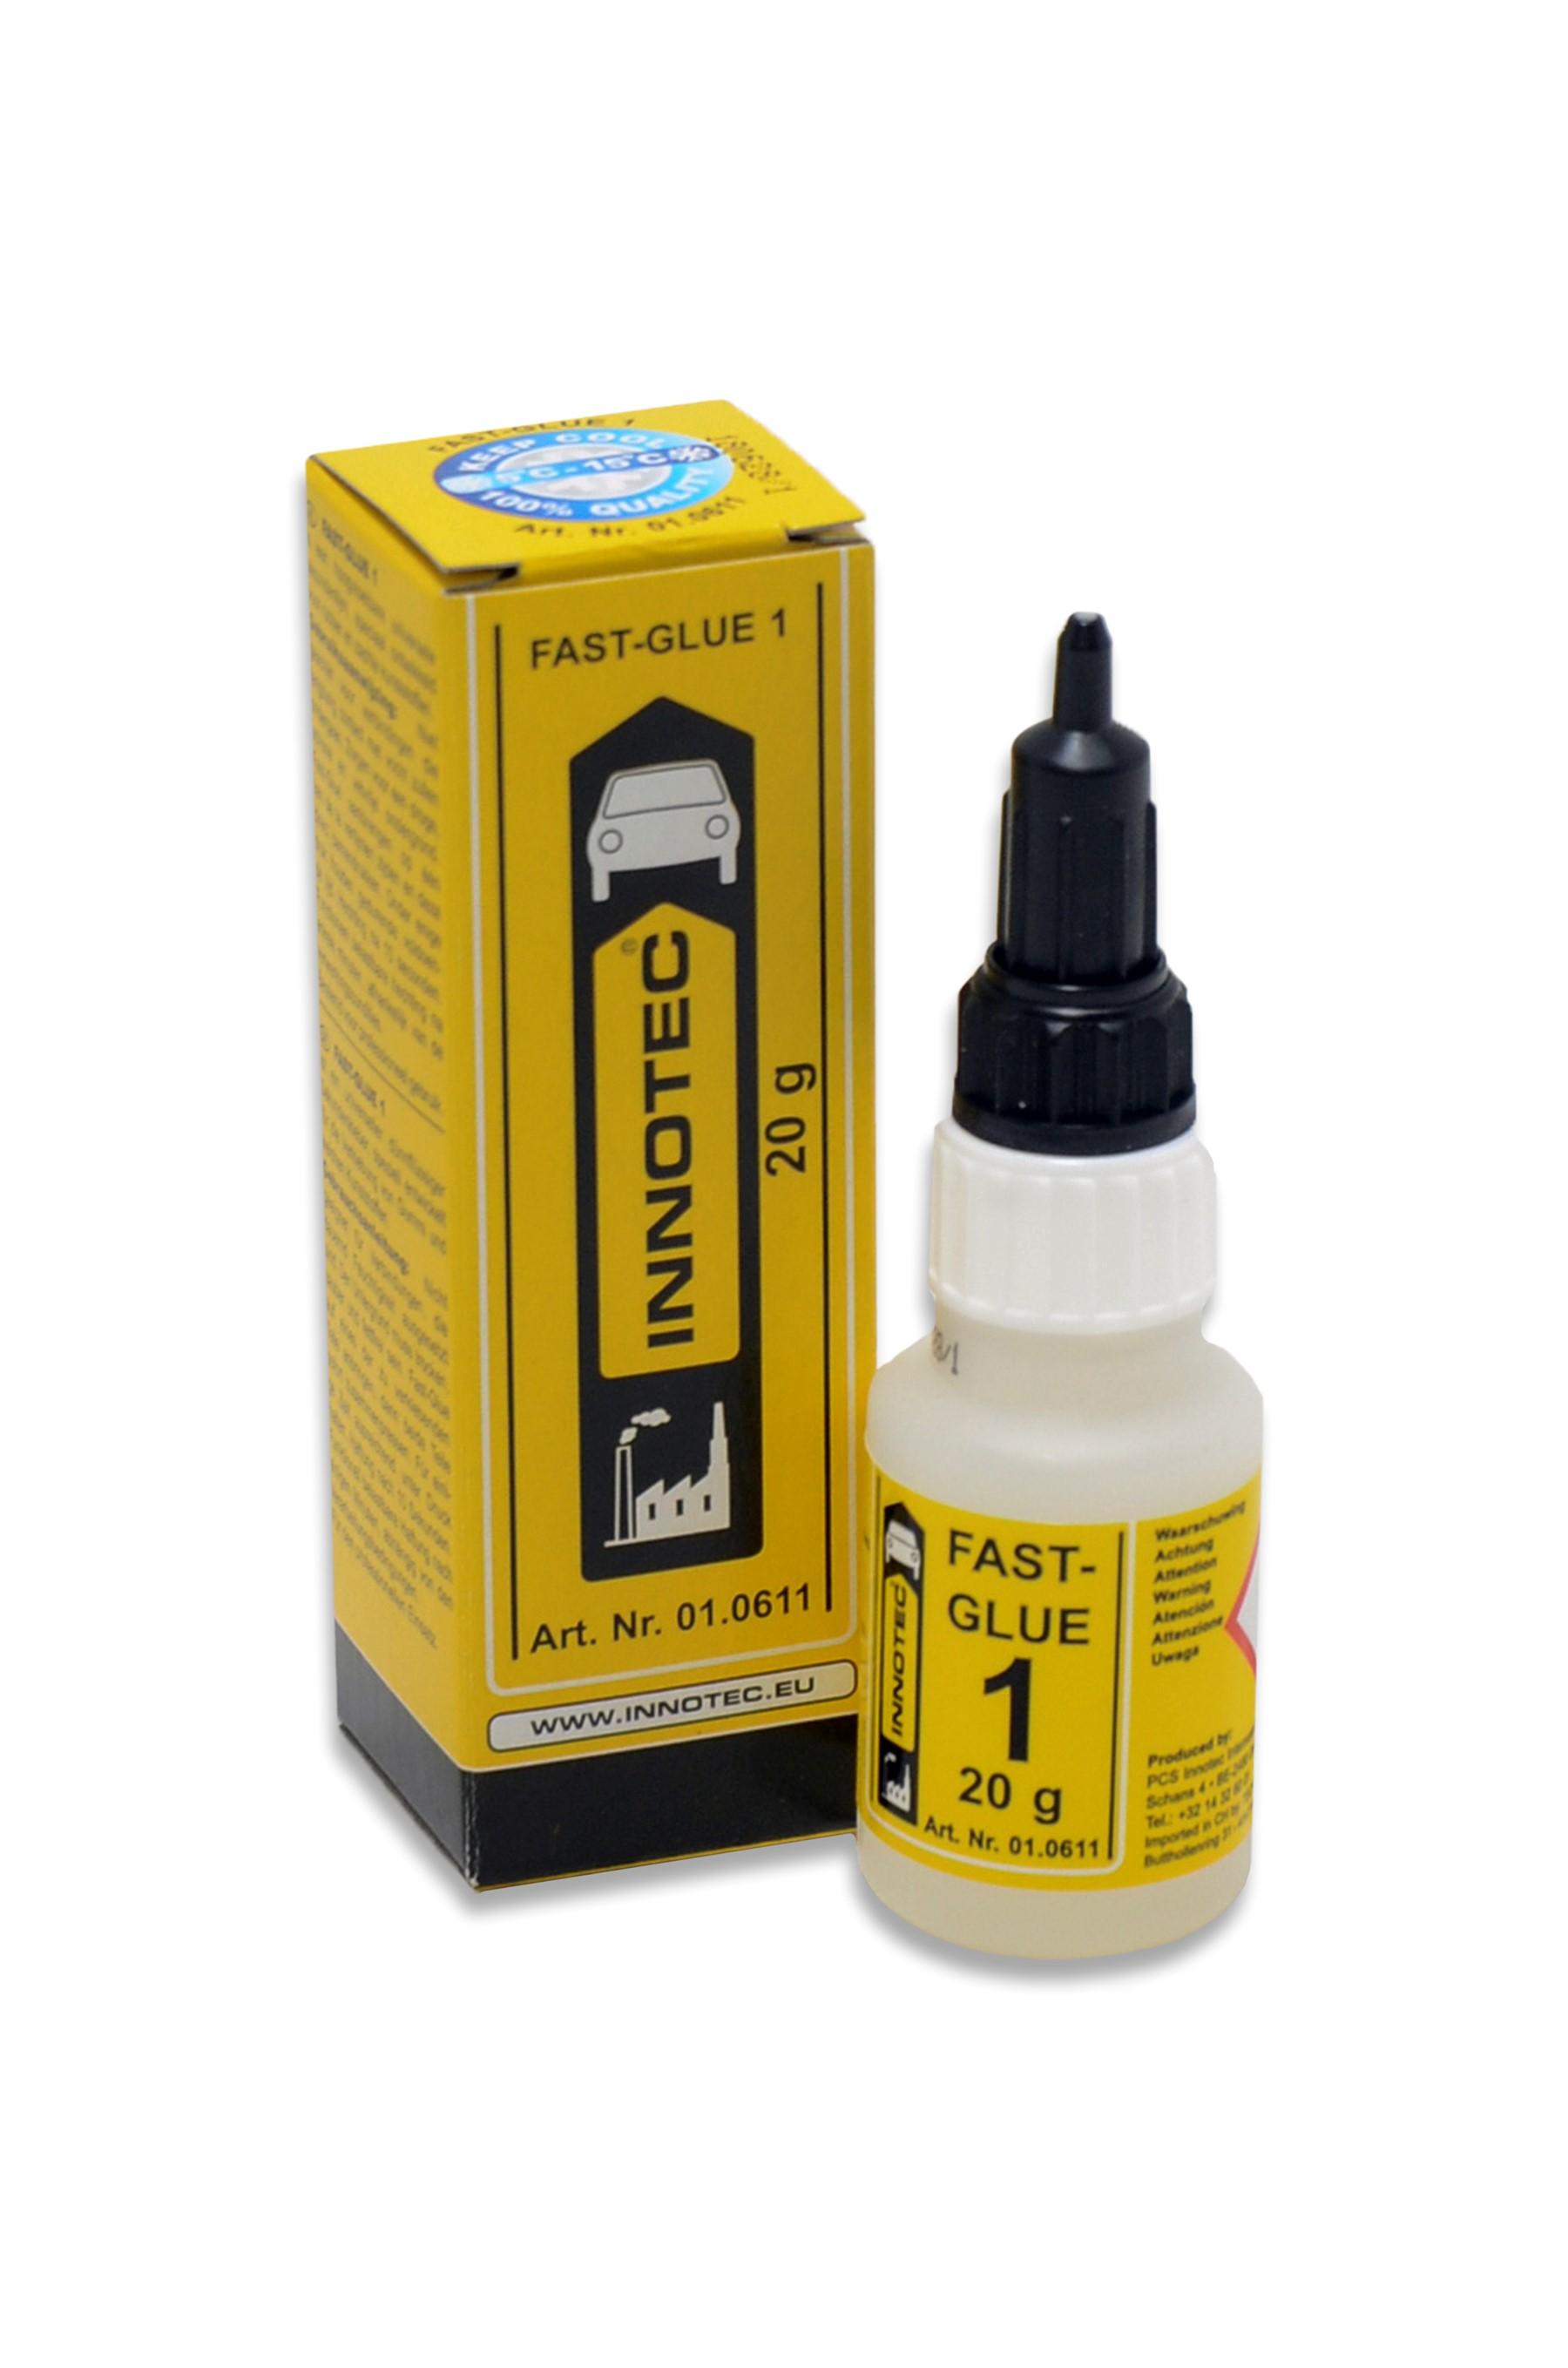 971_Fast-Glue1_flesje (Nieuwe witte nozz